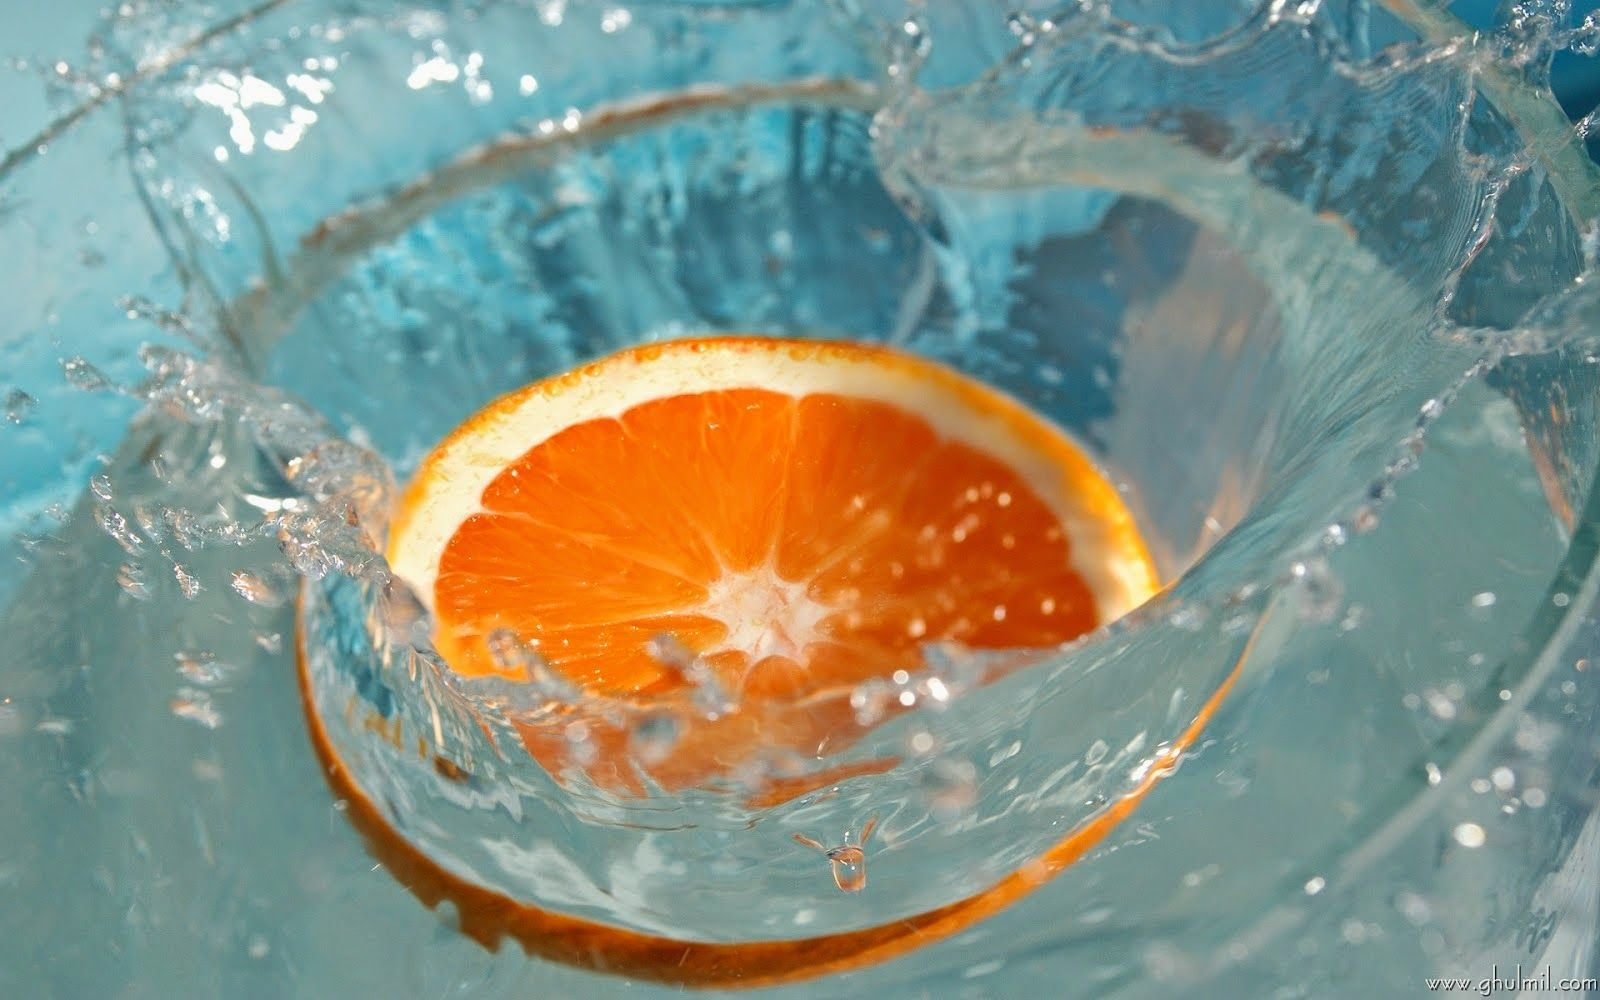 Beautiful Windows 7 Background Hd Wallpaper Free 4k Fruit Wallpaper Photography Orange Fruit Splash Hd wallpaper orange slice bubbles macro